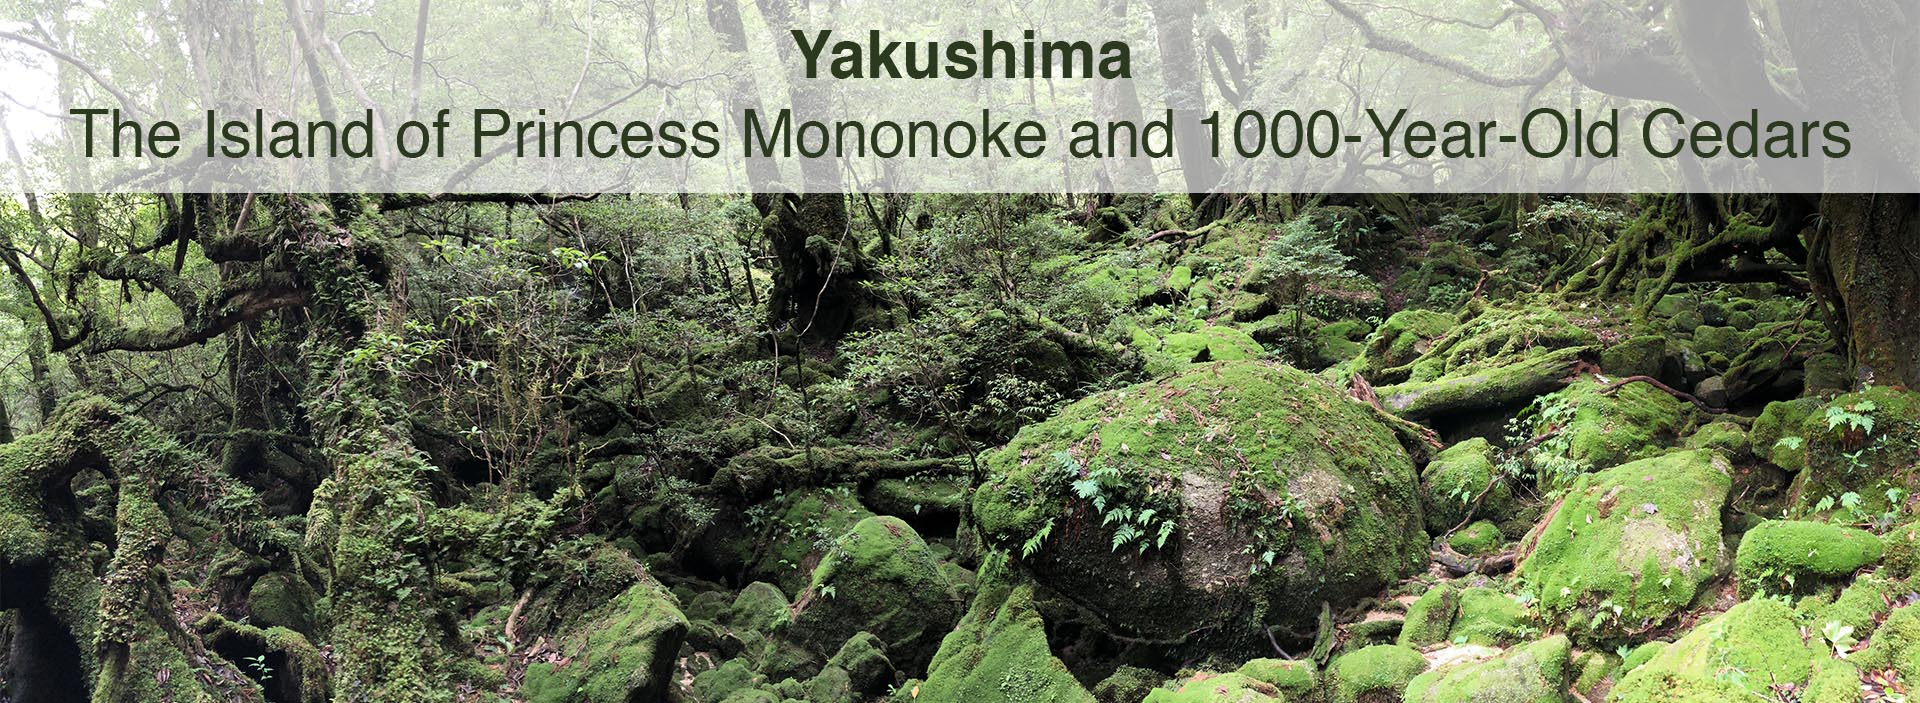 Yakushima: The Island of Princess Mononoke and 1000-Year-Old Cedars